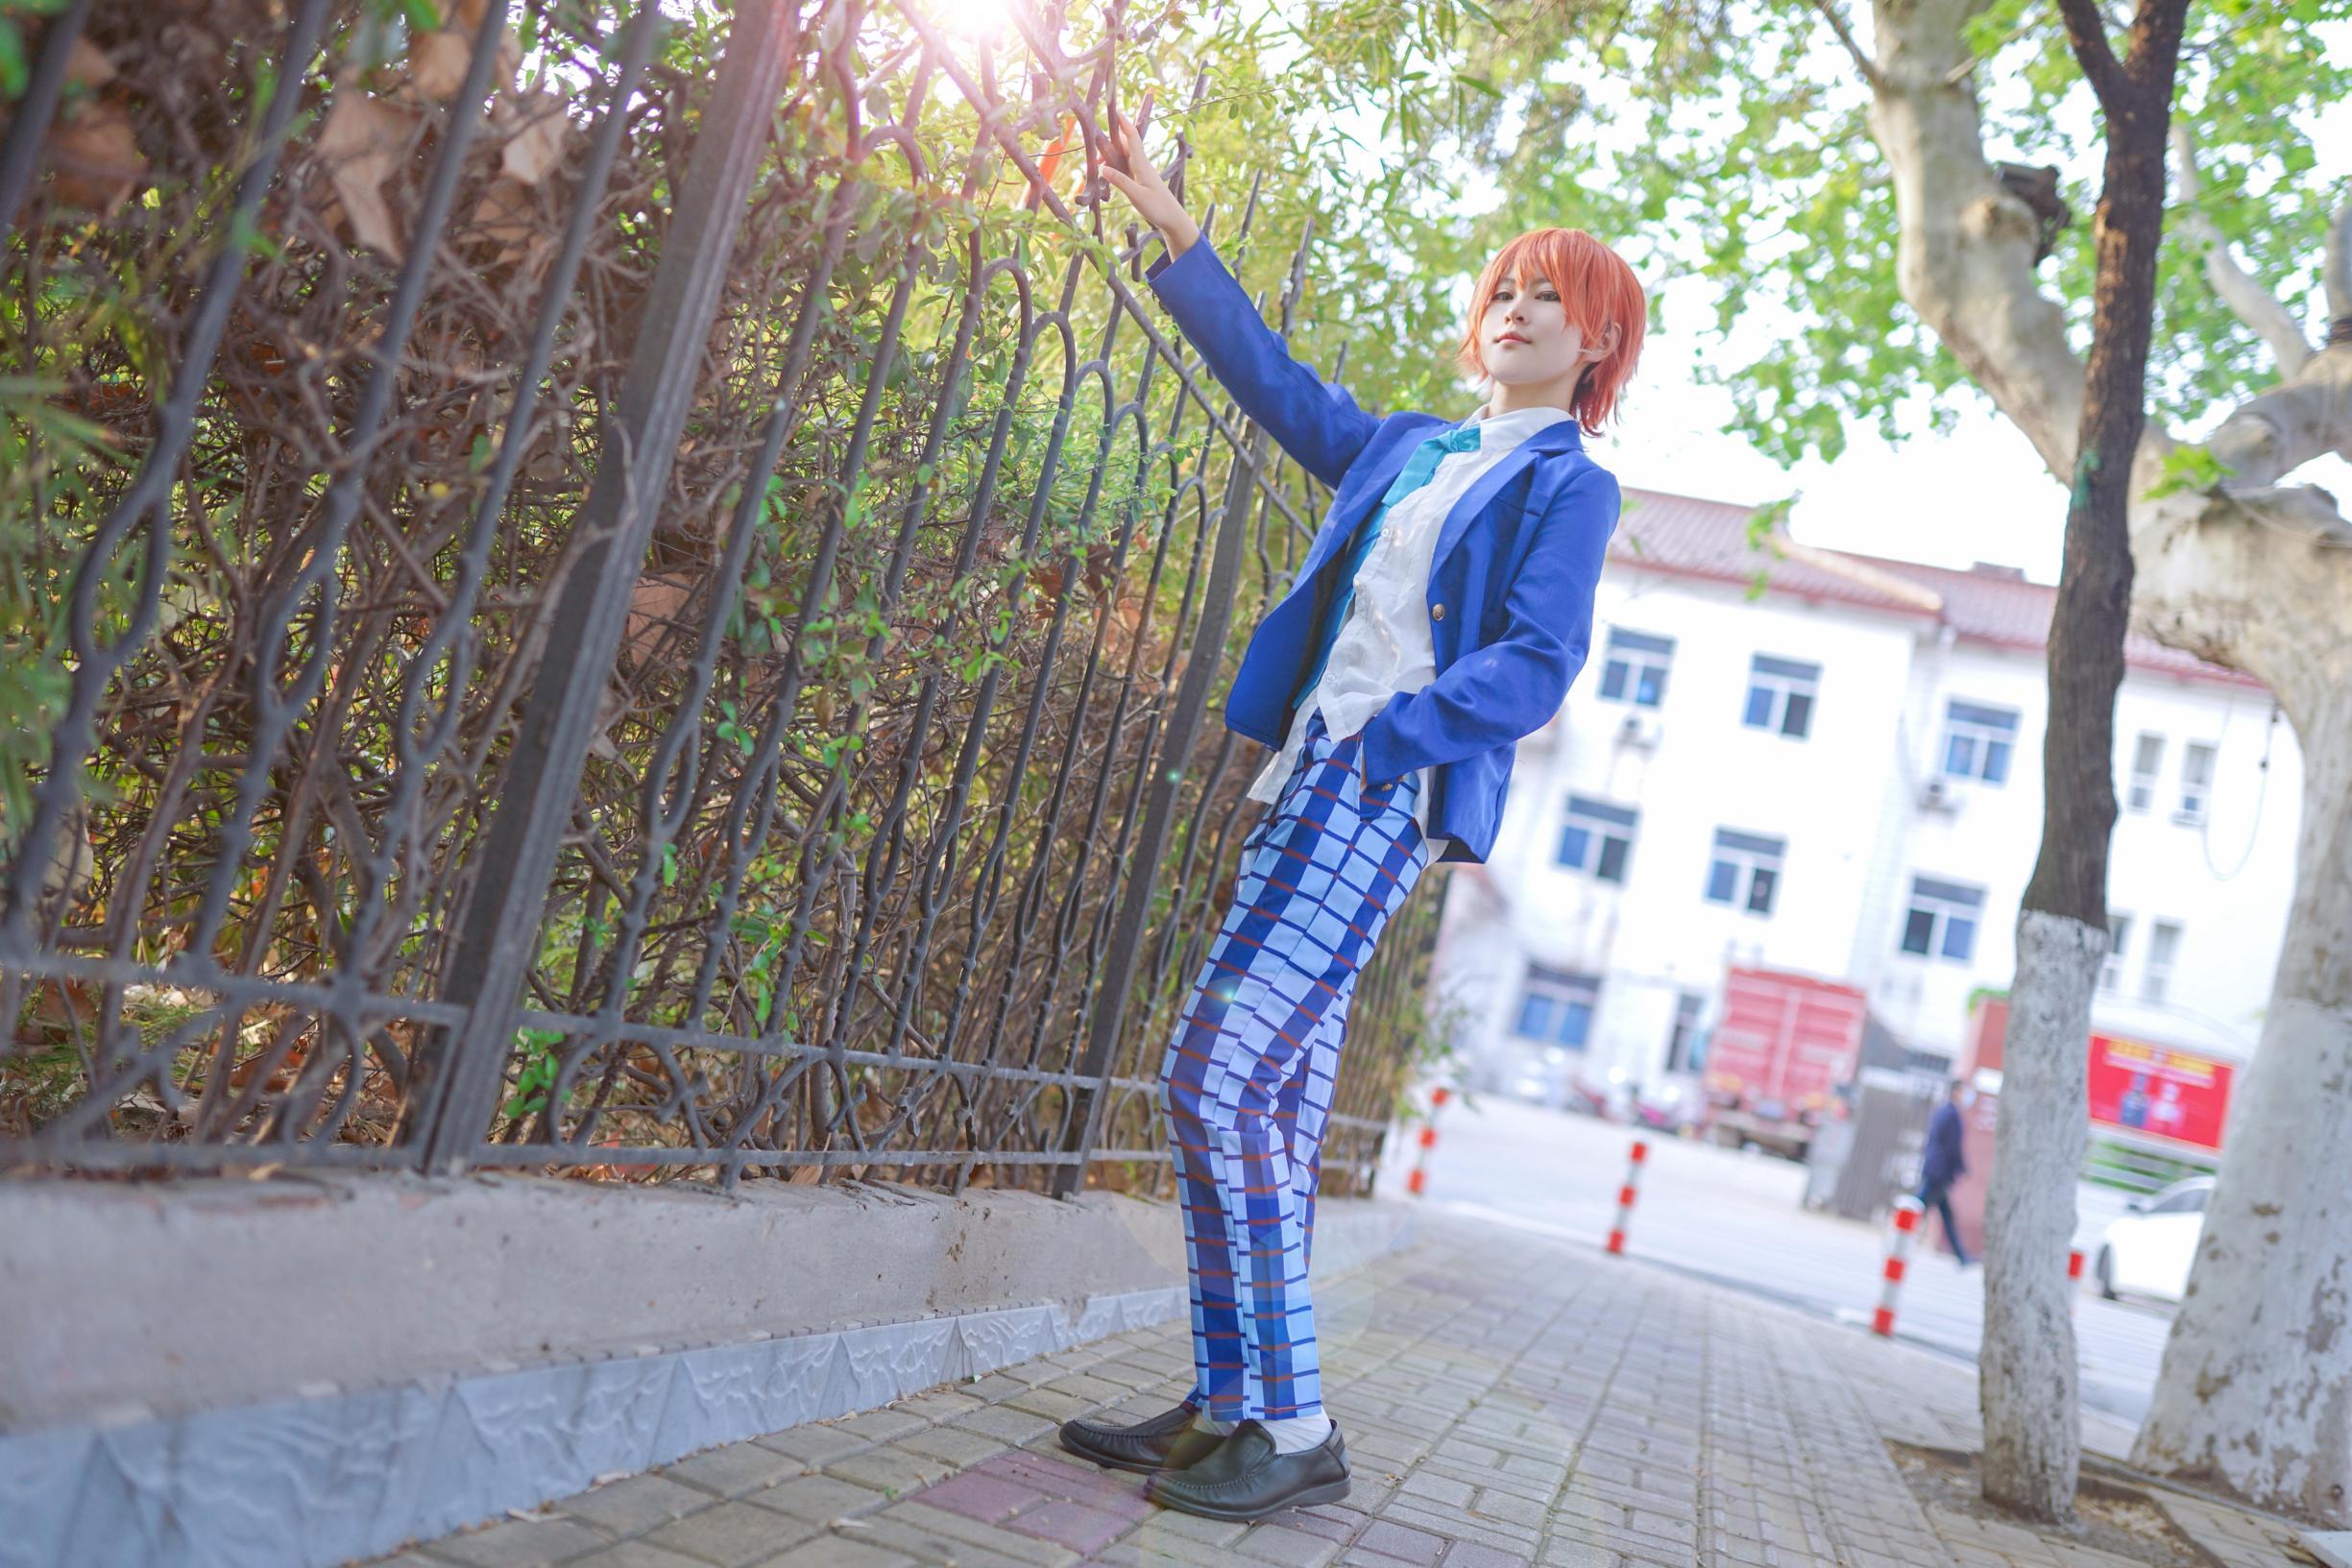 《LOVE LIVE!》正片cosplay【CN:_李笑颜Lee】-第9张